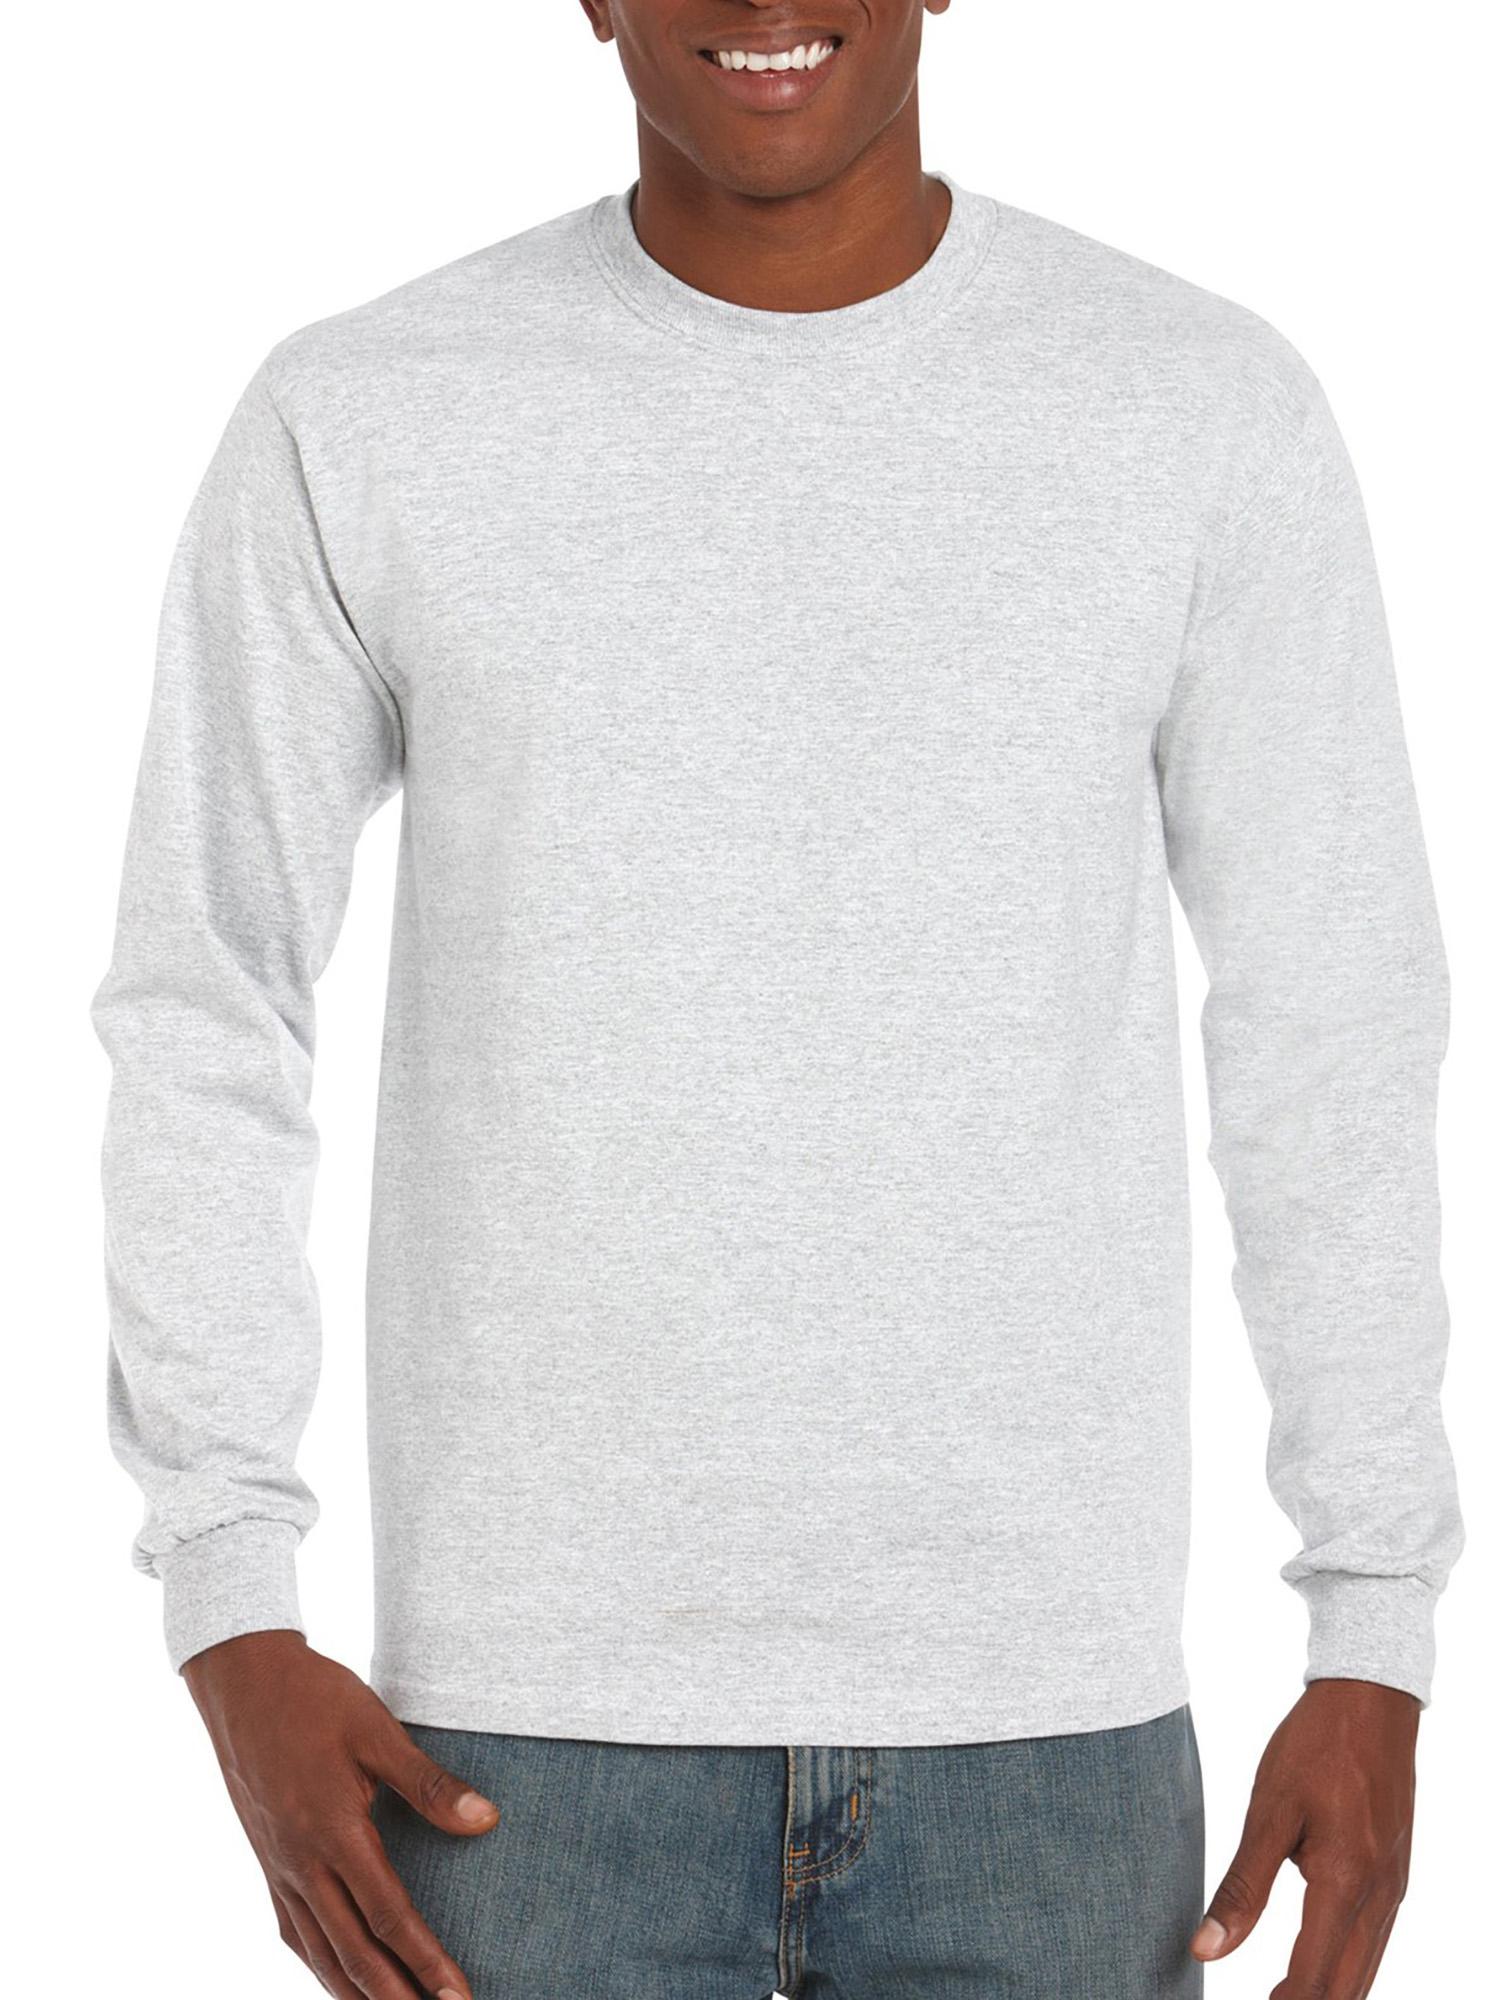 Gildan - Gildan Mens Classic Long Sleeve T-Shirt - Walmart.com